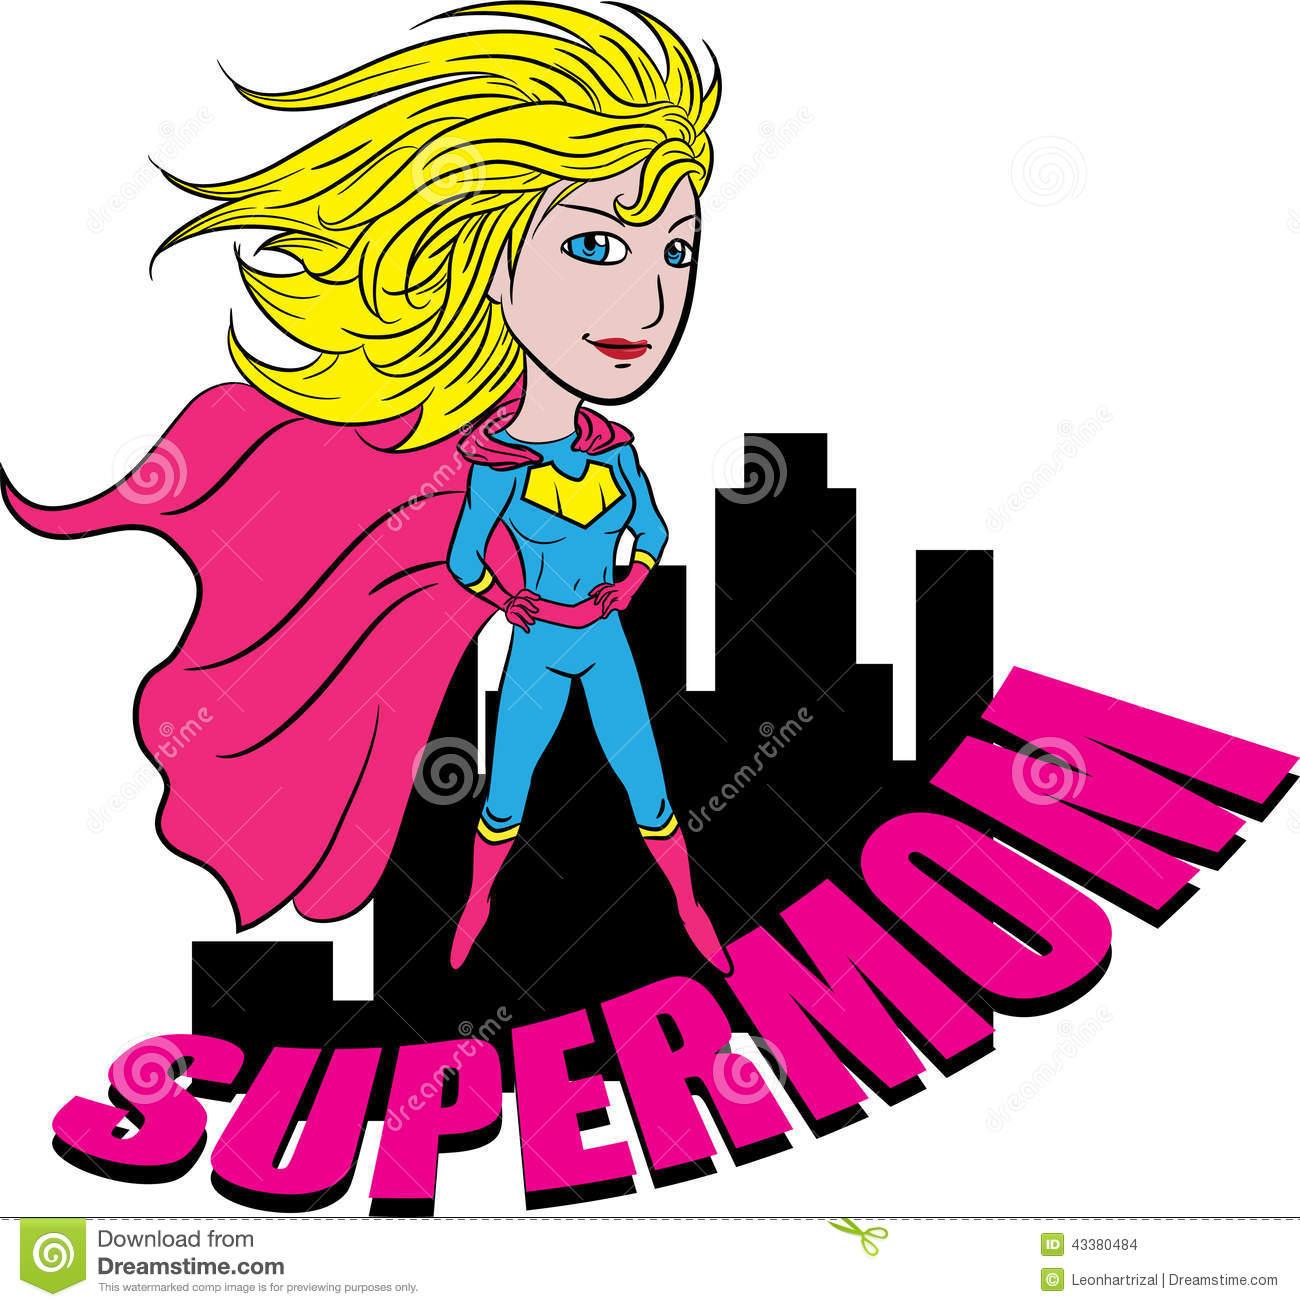 Supermom Stock Images-Supermom Stock Images-18